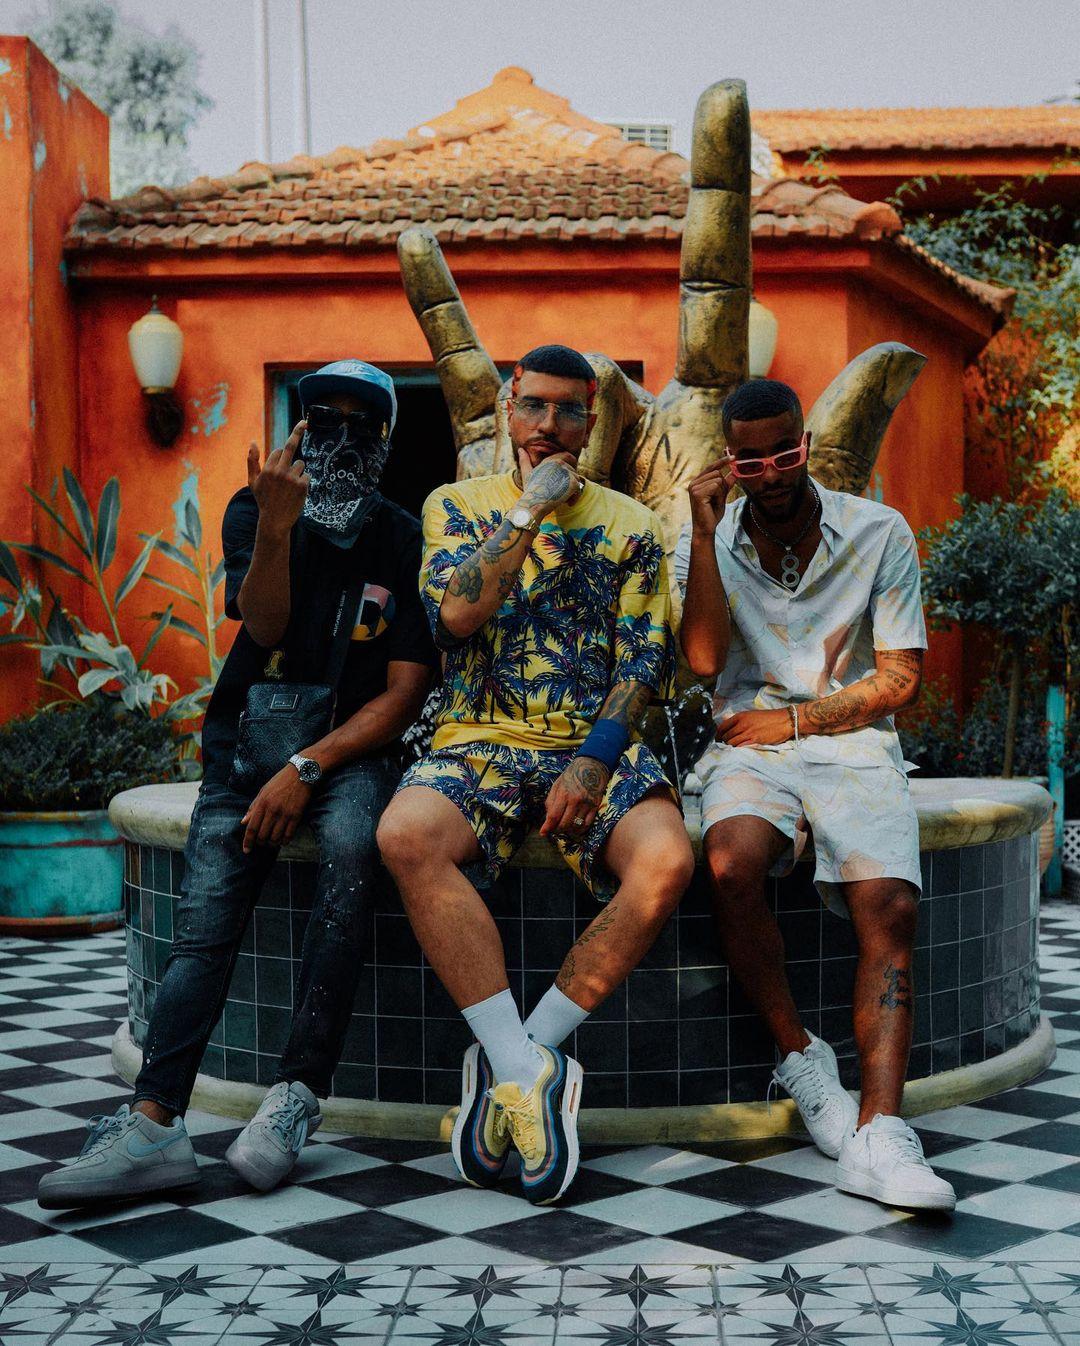 """Dominicana Latina"" – Ο SNIK ξάφνιασε τους πάντες και μπήκε κατευθείαν στο Νο1 των trends! SNIK ft SALVA"